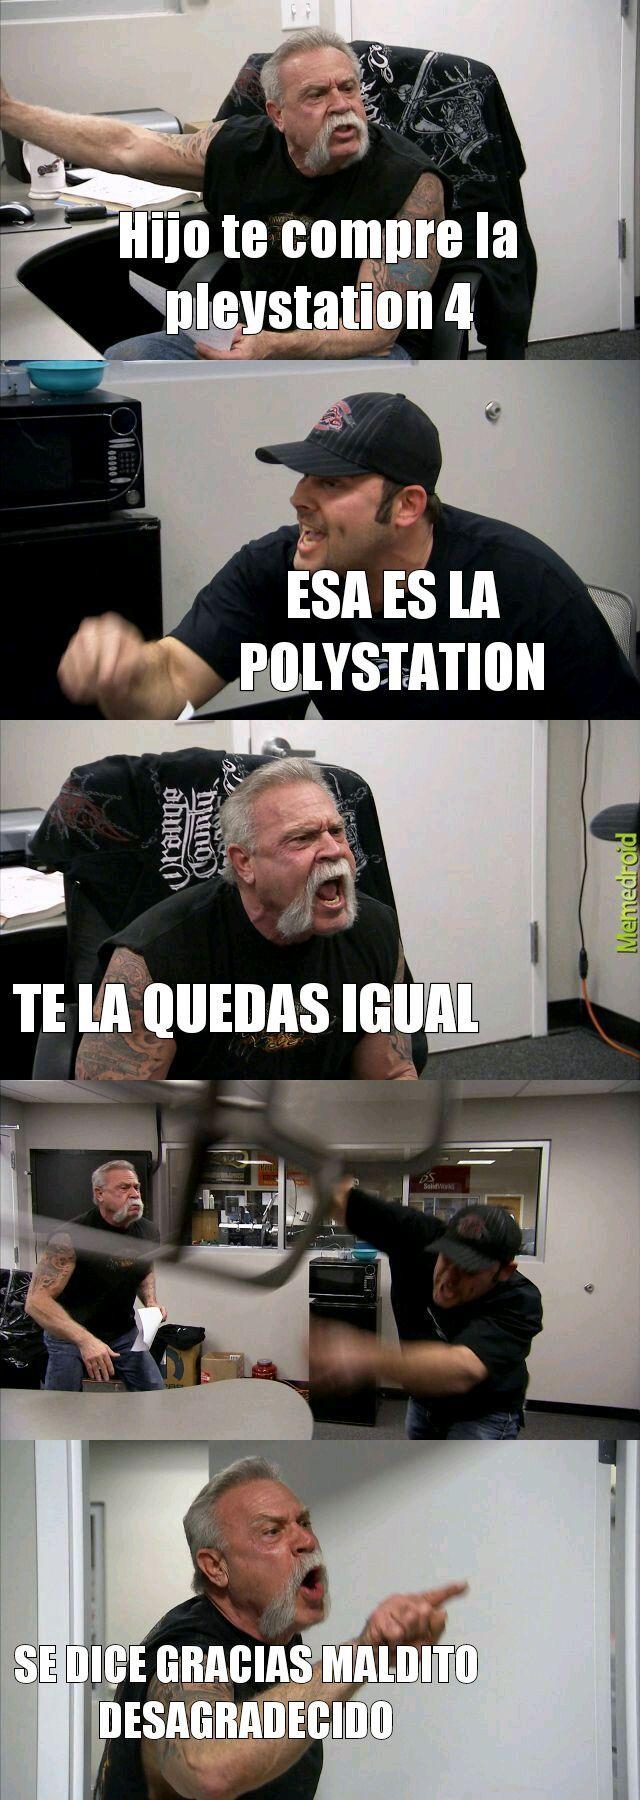 MiPoly4.jpg - meme